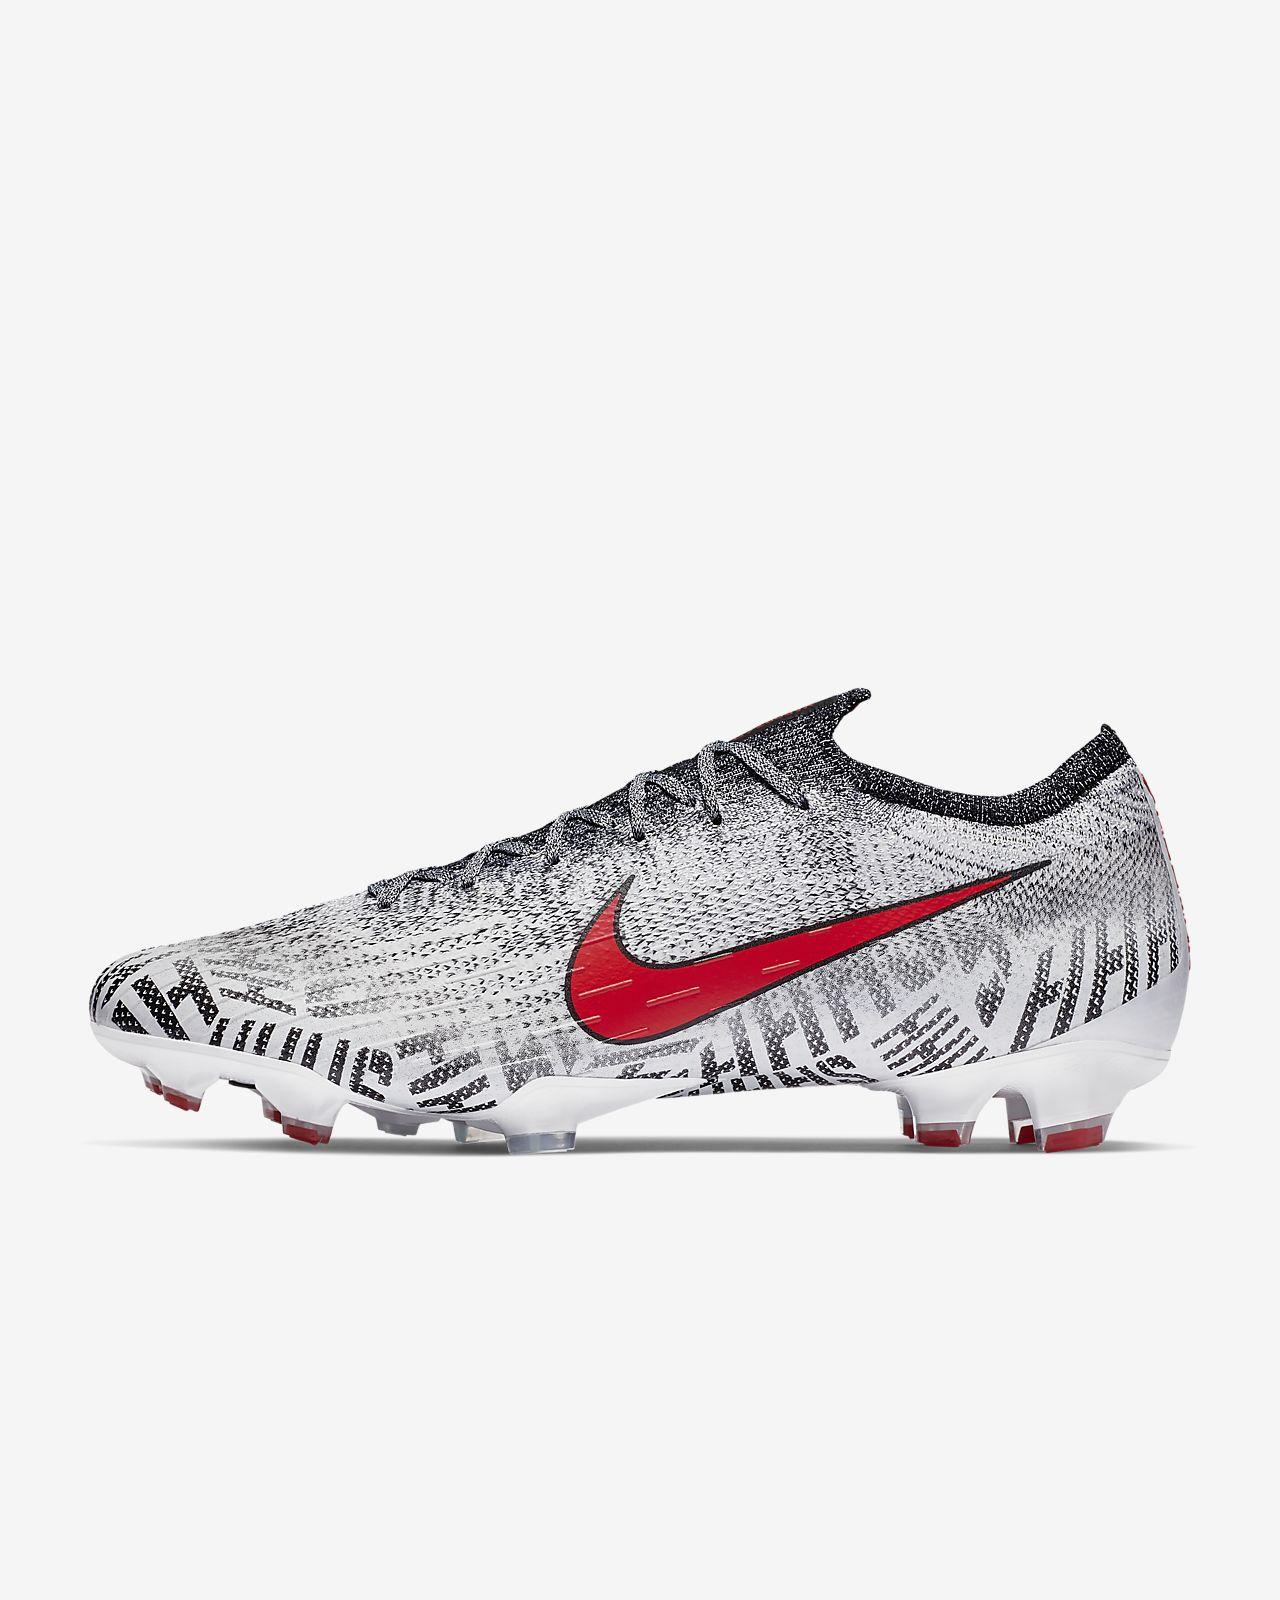 sale retailer 1d4a7 8e335 ... Scarpa da calcio per terreni duri Nike Mercurial Vapor 360 Elite Neymar  Jr